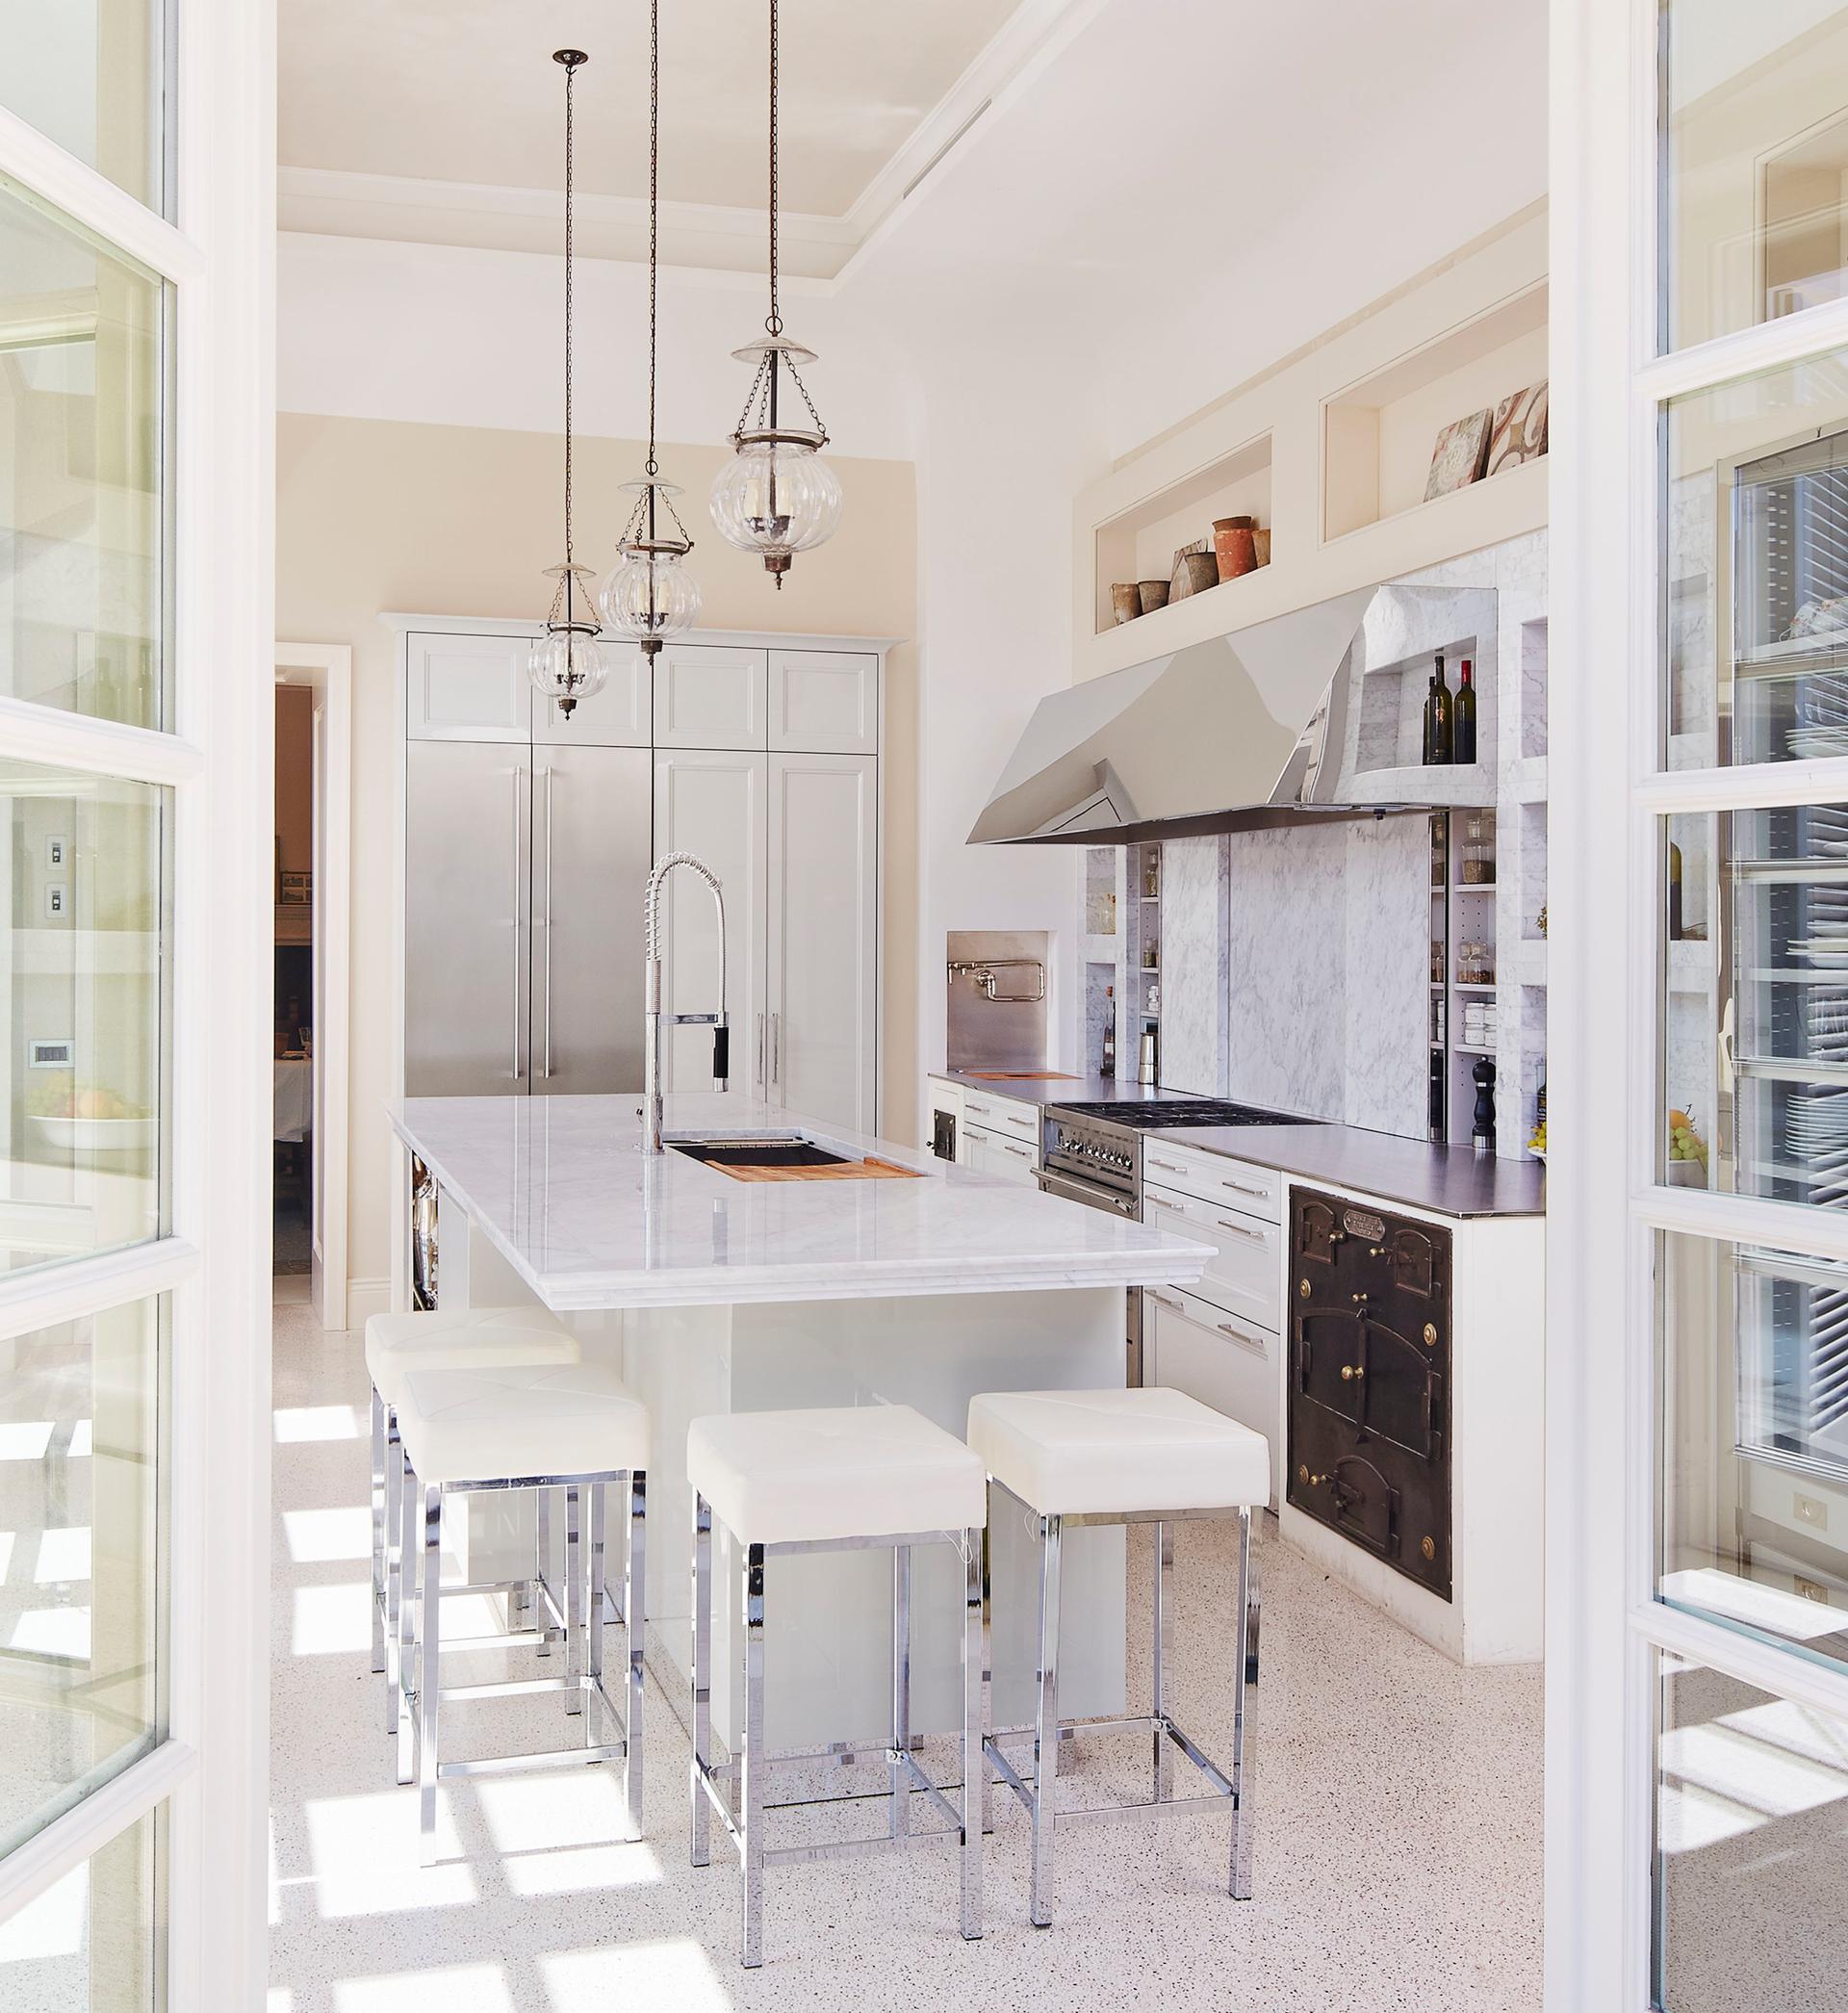 Regina Sturrock Design Inc product partnerships | kitchen & bath design news